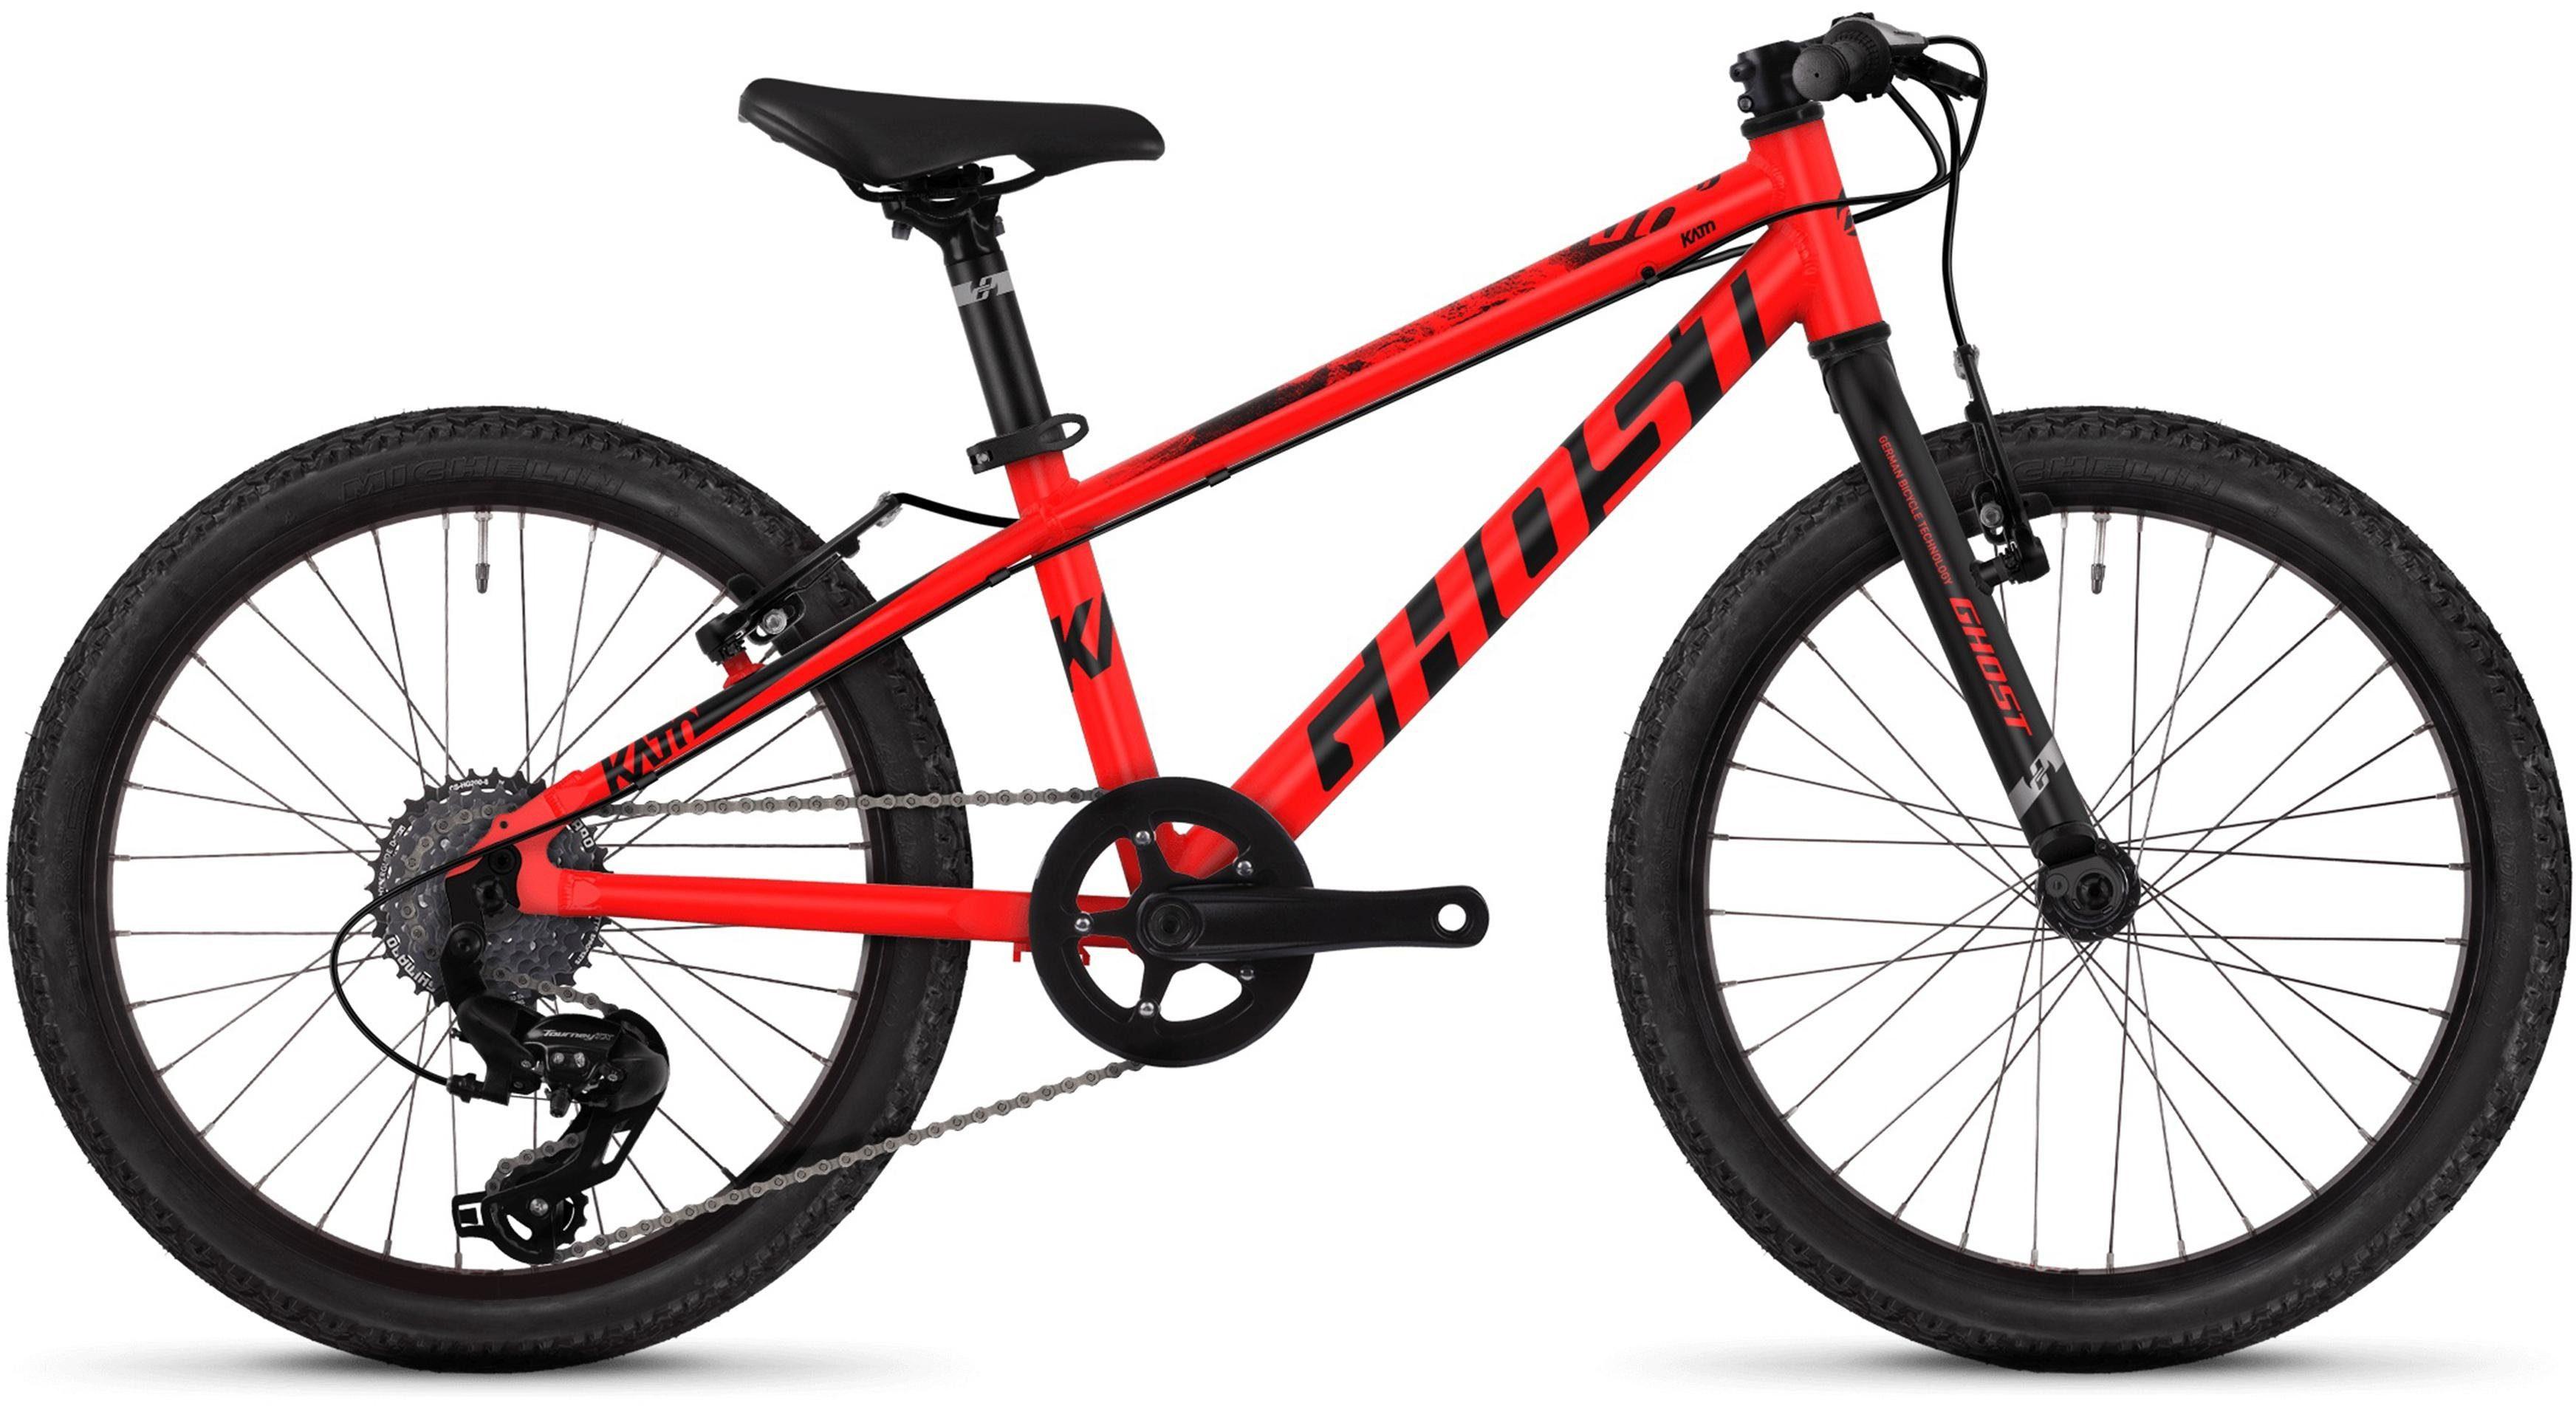 Ghost Mountainbike »Kato R1.0 AL U«, 8 Gang Shimano Tourney TX RD-TX800 8-S Schaltwerk, Kettenschaltung